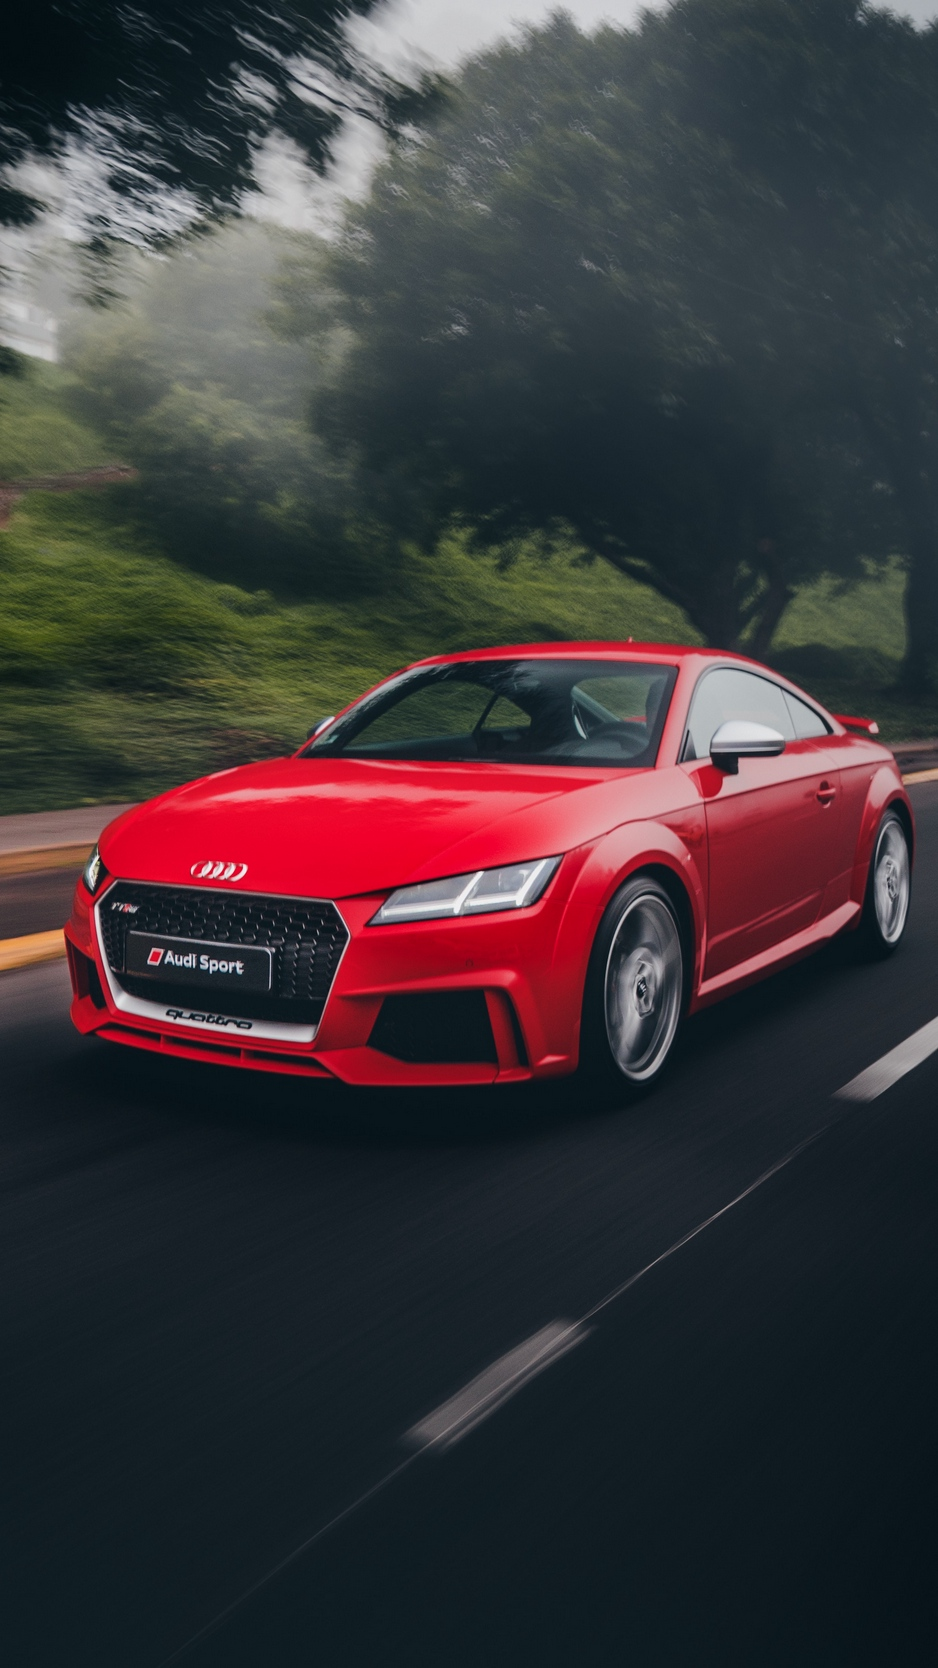 Wallpaper Audi Tt, Audi, Sports Car, Road, Movement - Audi Tt Wallpaper Iphone , HD Wallpaper & Backgrounds